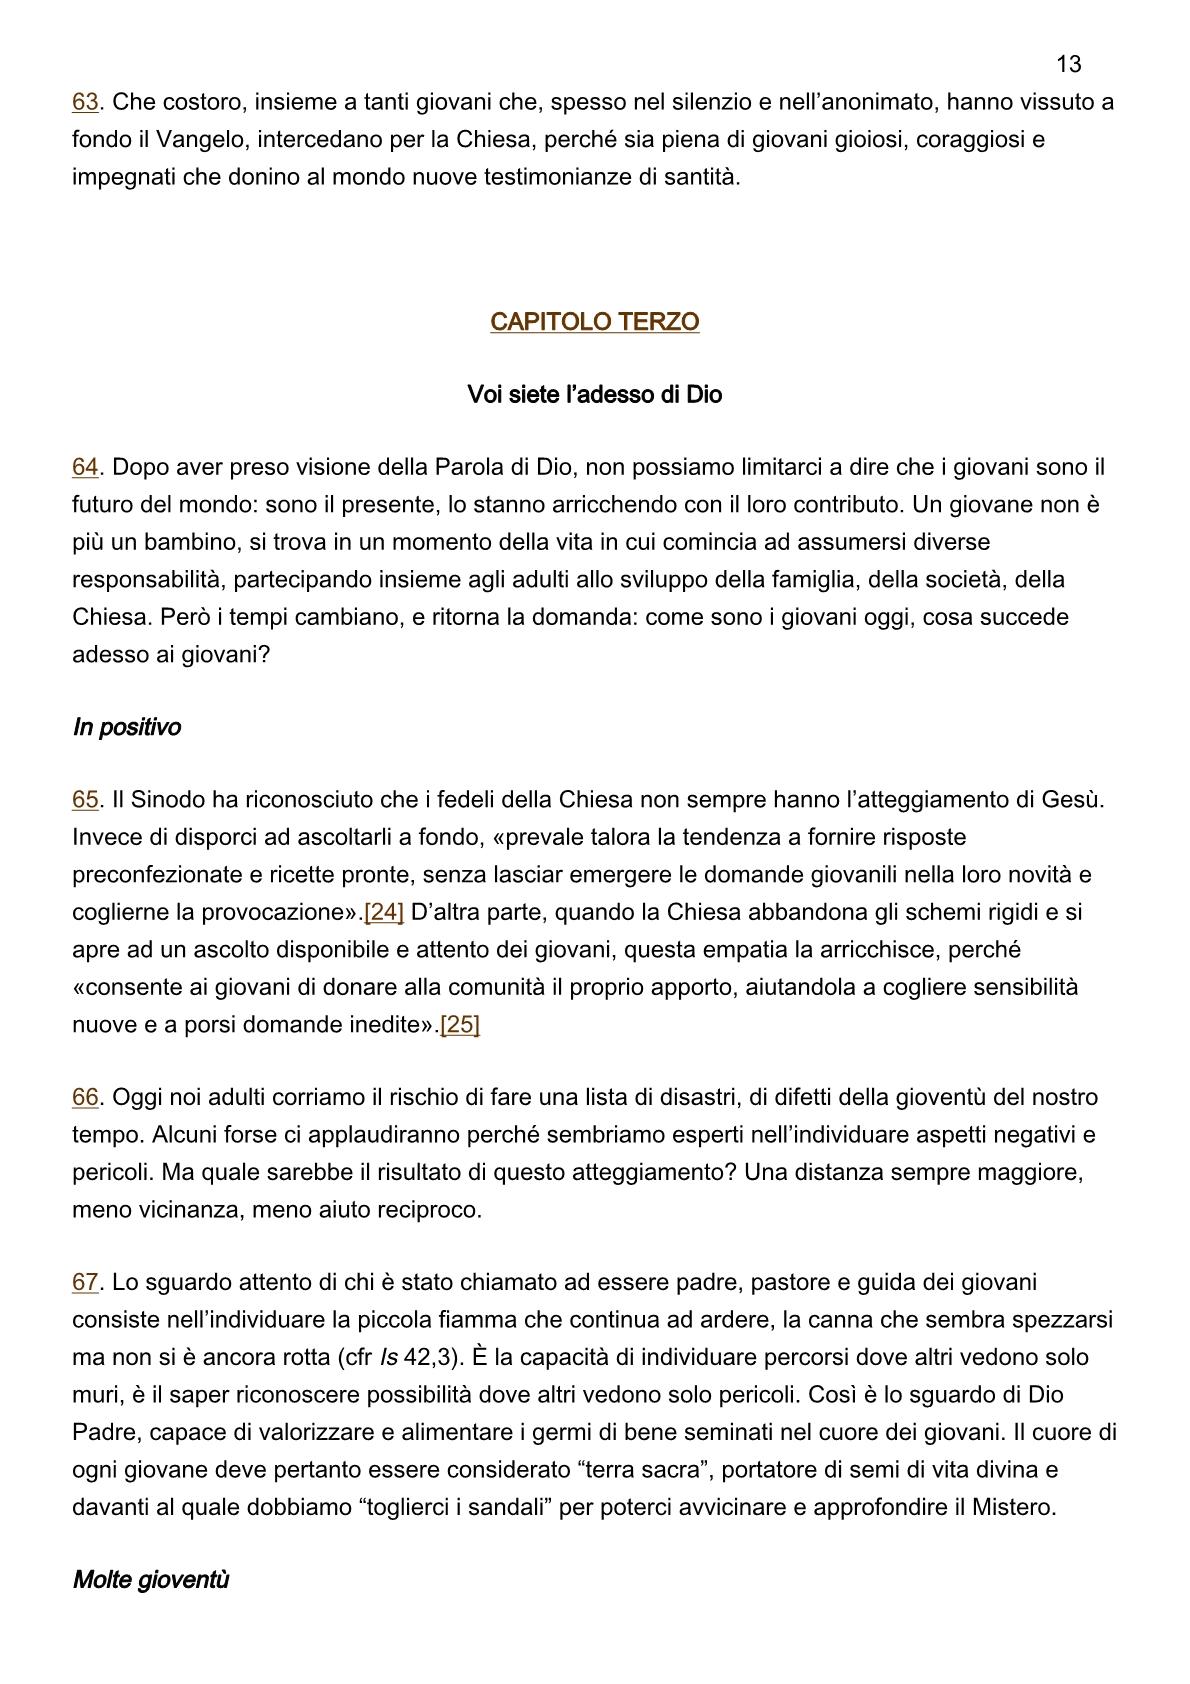 papa-francesco_esortazione-ap_20190325_christus-vivit13